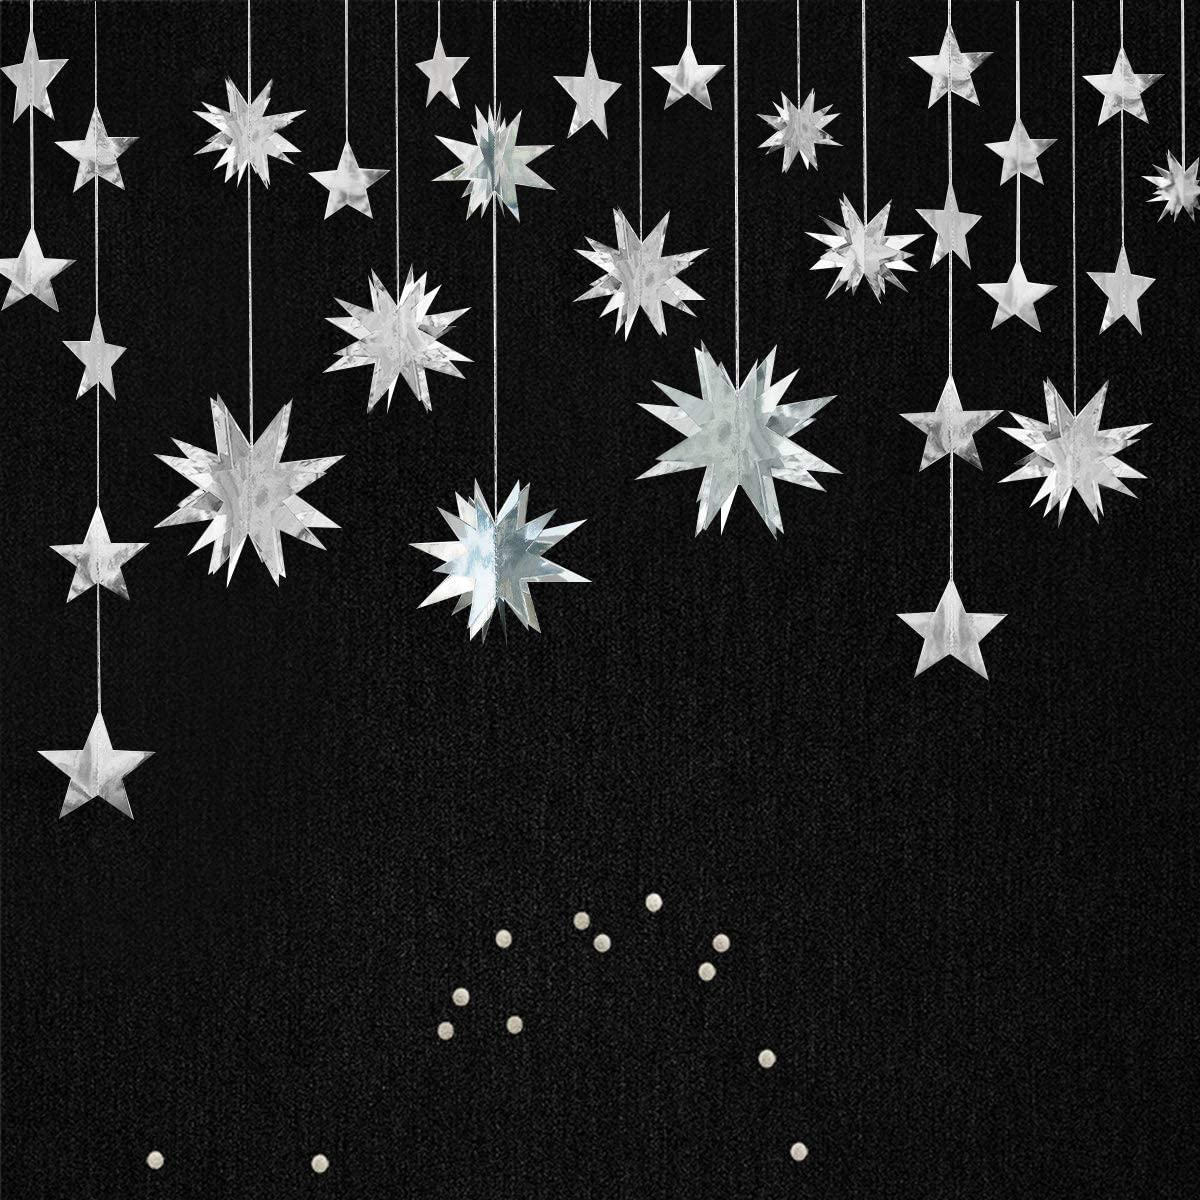 QA/_ HANGING CHRISTMAS STAR 3D ORNAMENT BANNER STRING WINDOW MALL XMAS DECOR OP